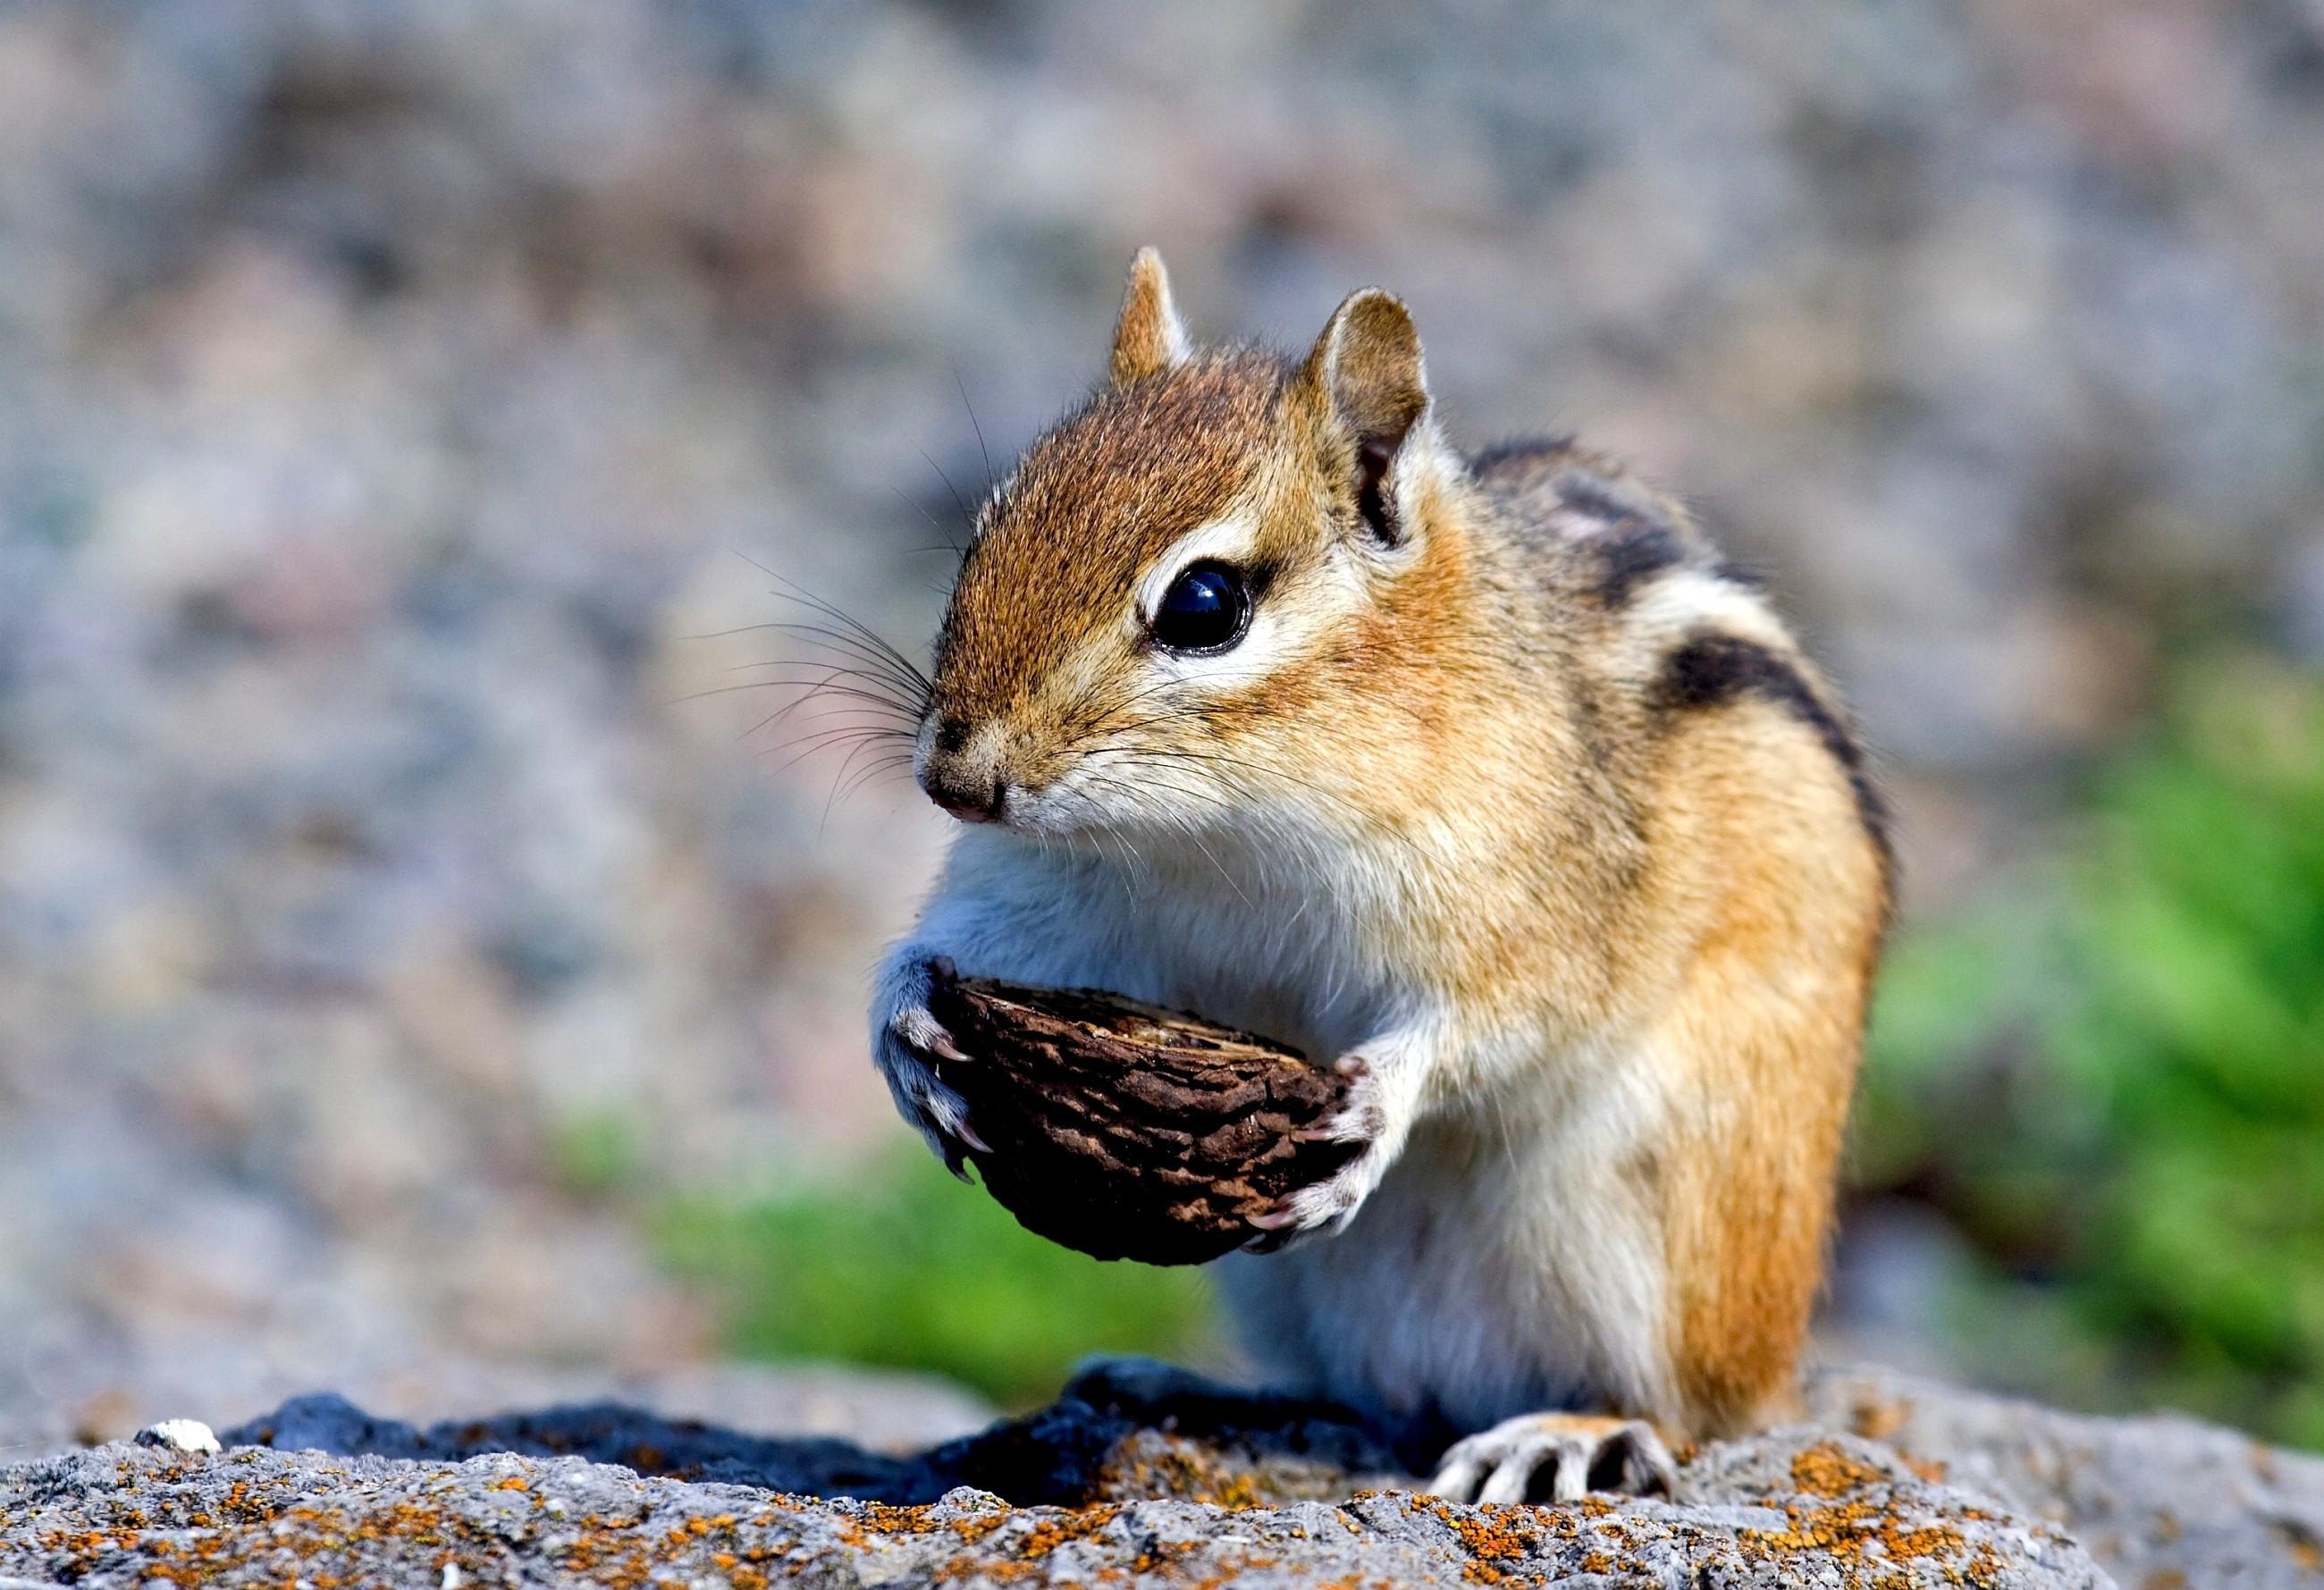 бурундук с арахисом  № 136433 загрузить